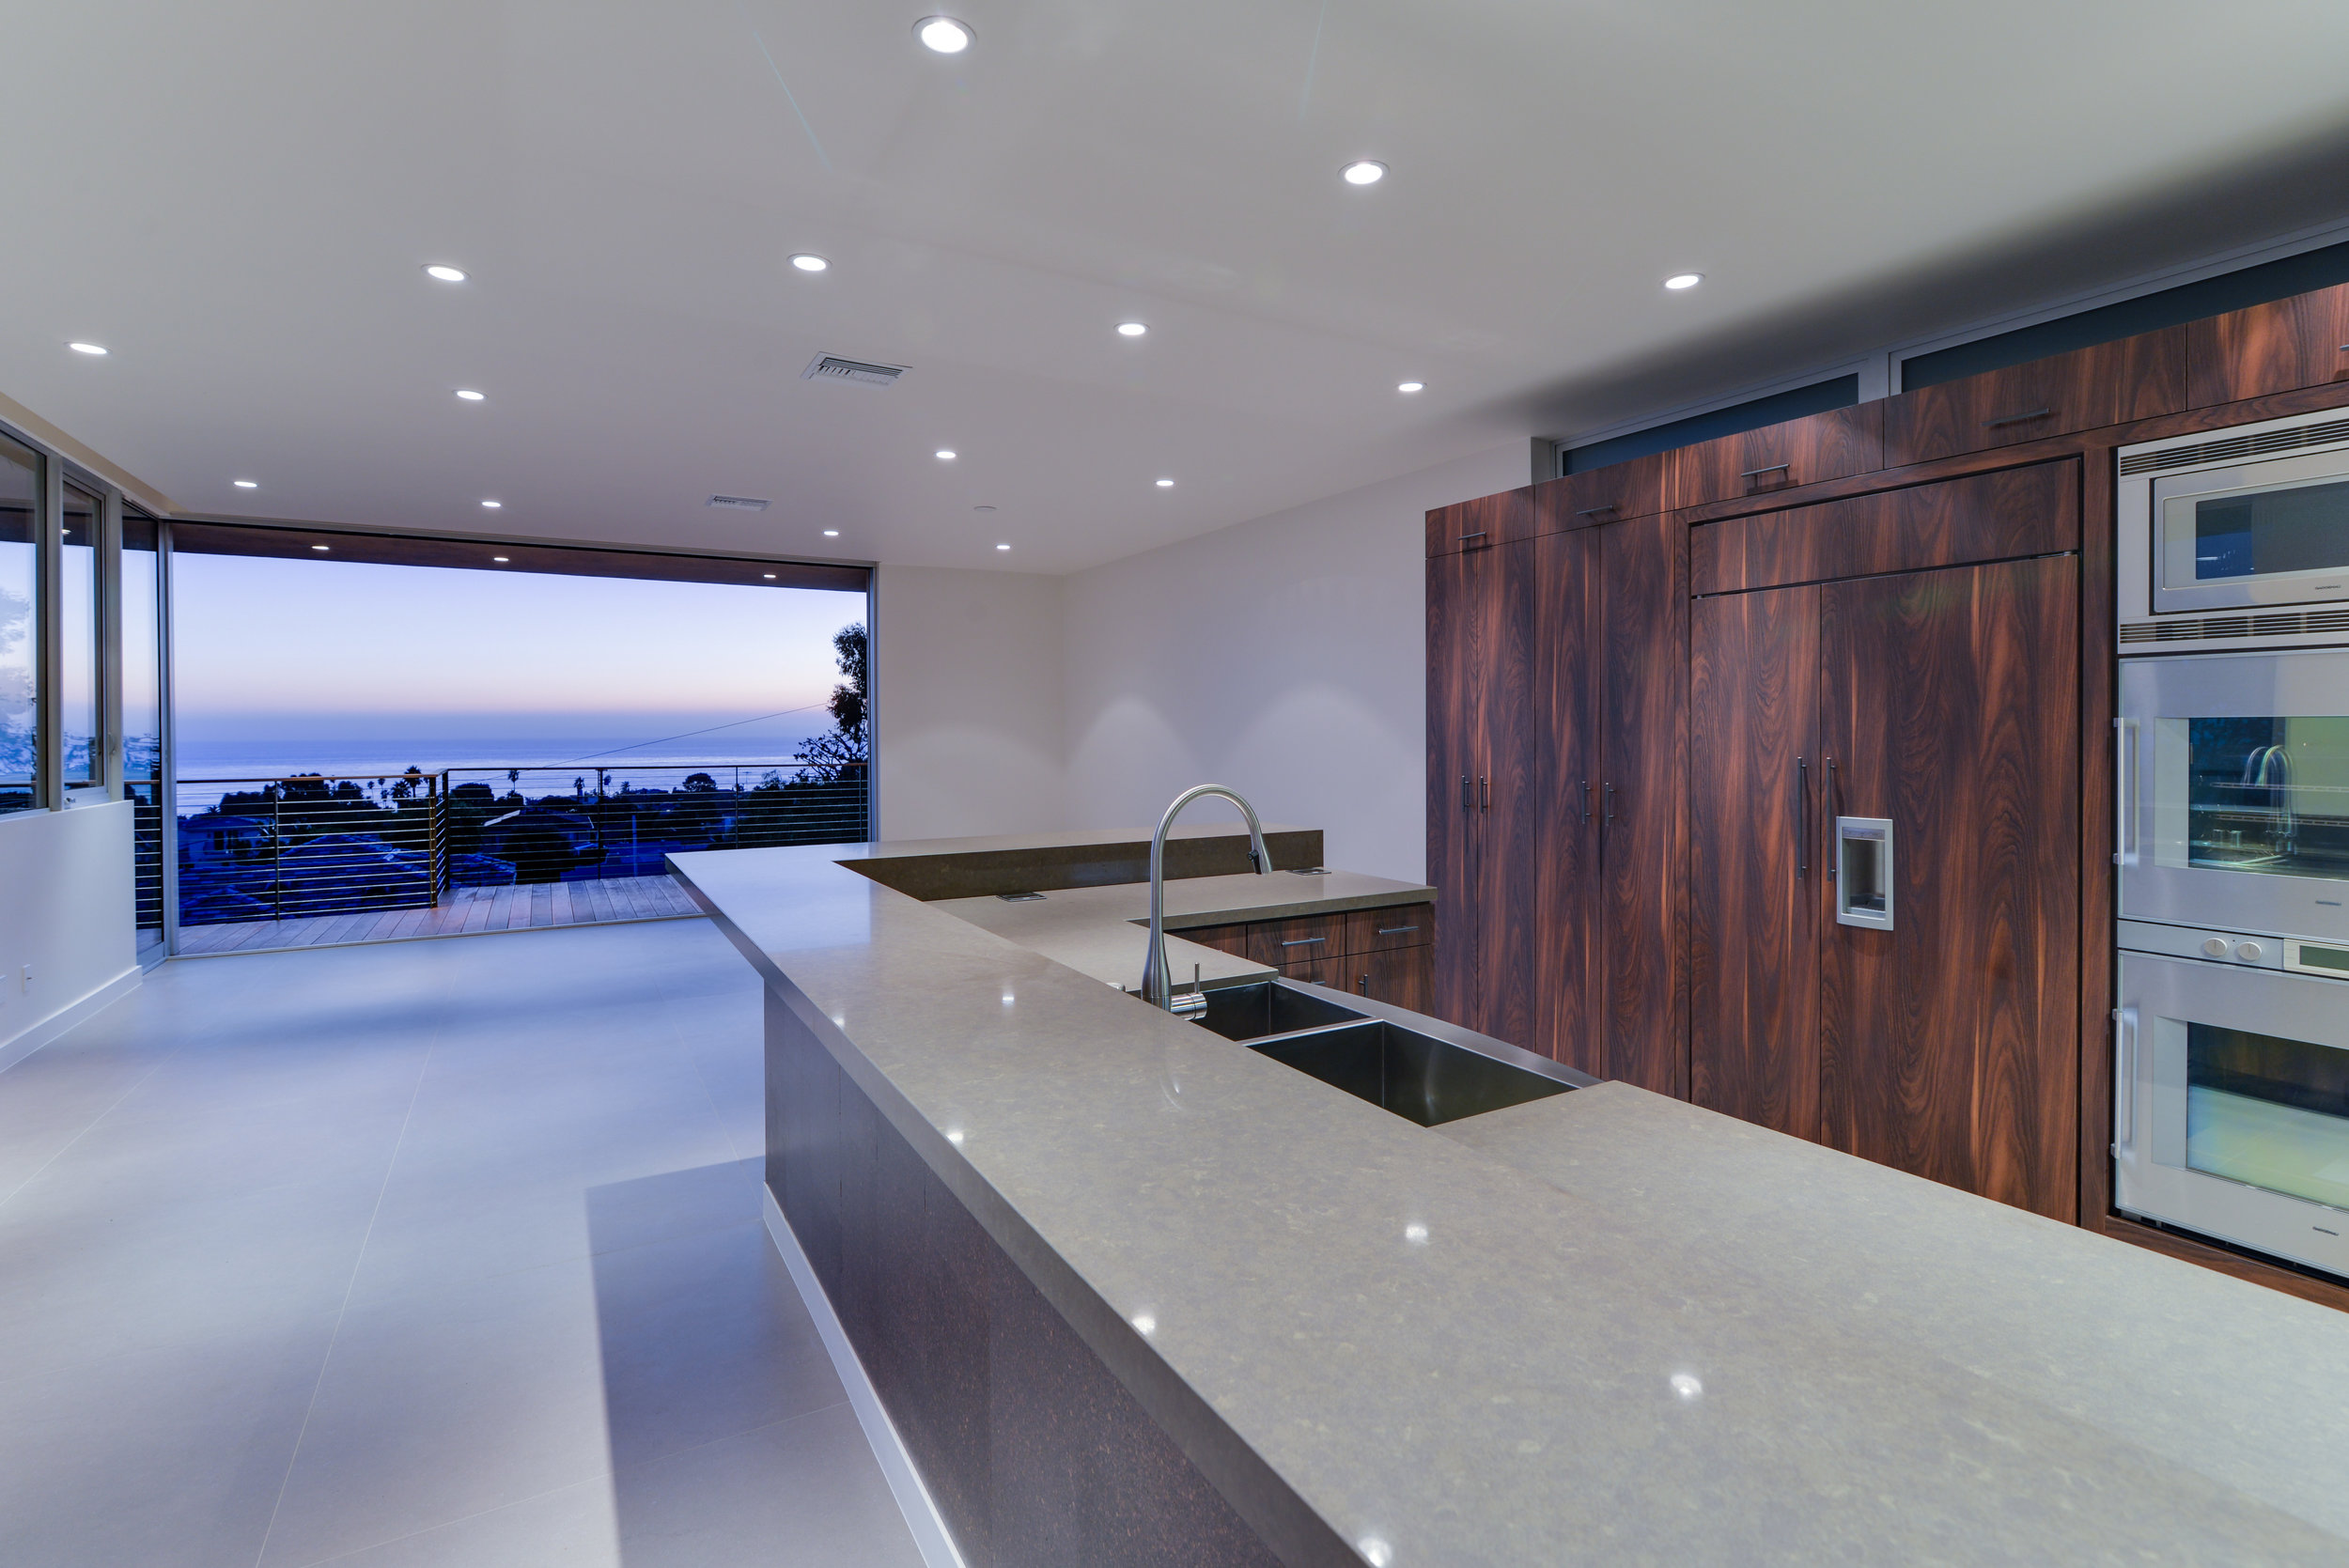 S.E.A.-Studio-Environmental-Architecture-David-Hertz-FAIA-Linda-Rosa-House-La-Jolla-San-Diego-sustainable-regenerative-restorative-design-modern-residential-mindful-garden-panoramic-ocean-view-open-concept-california-dream-16.jpg